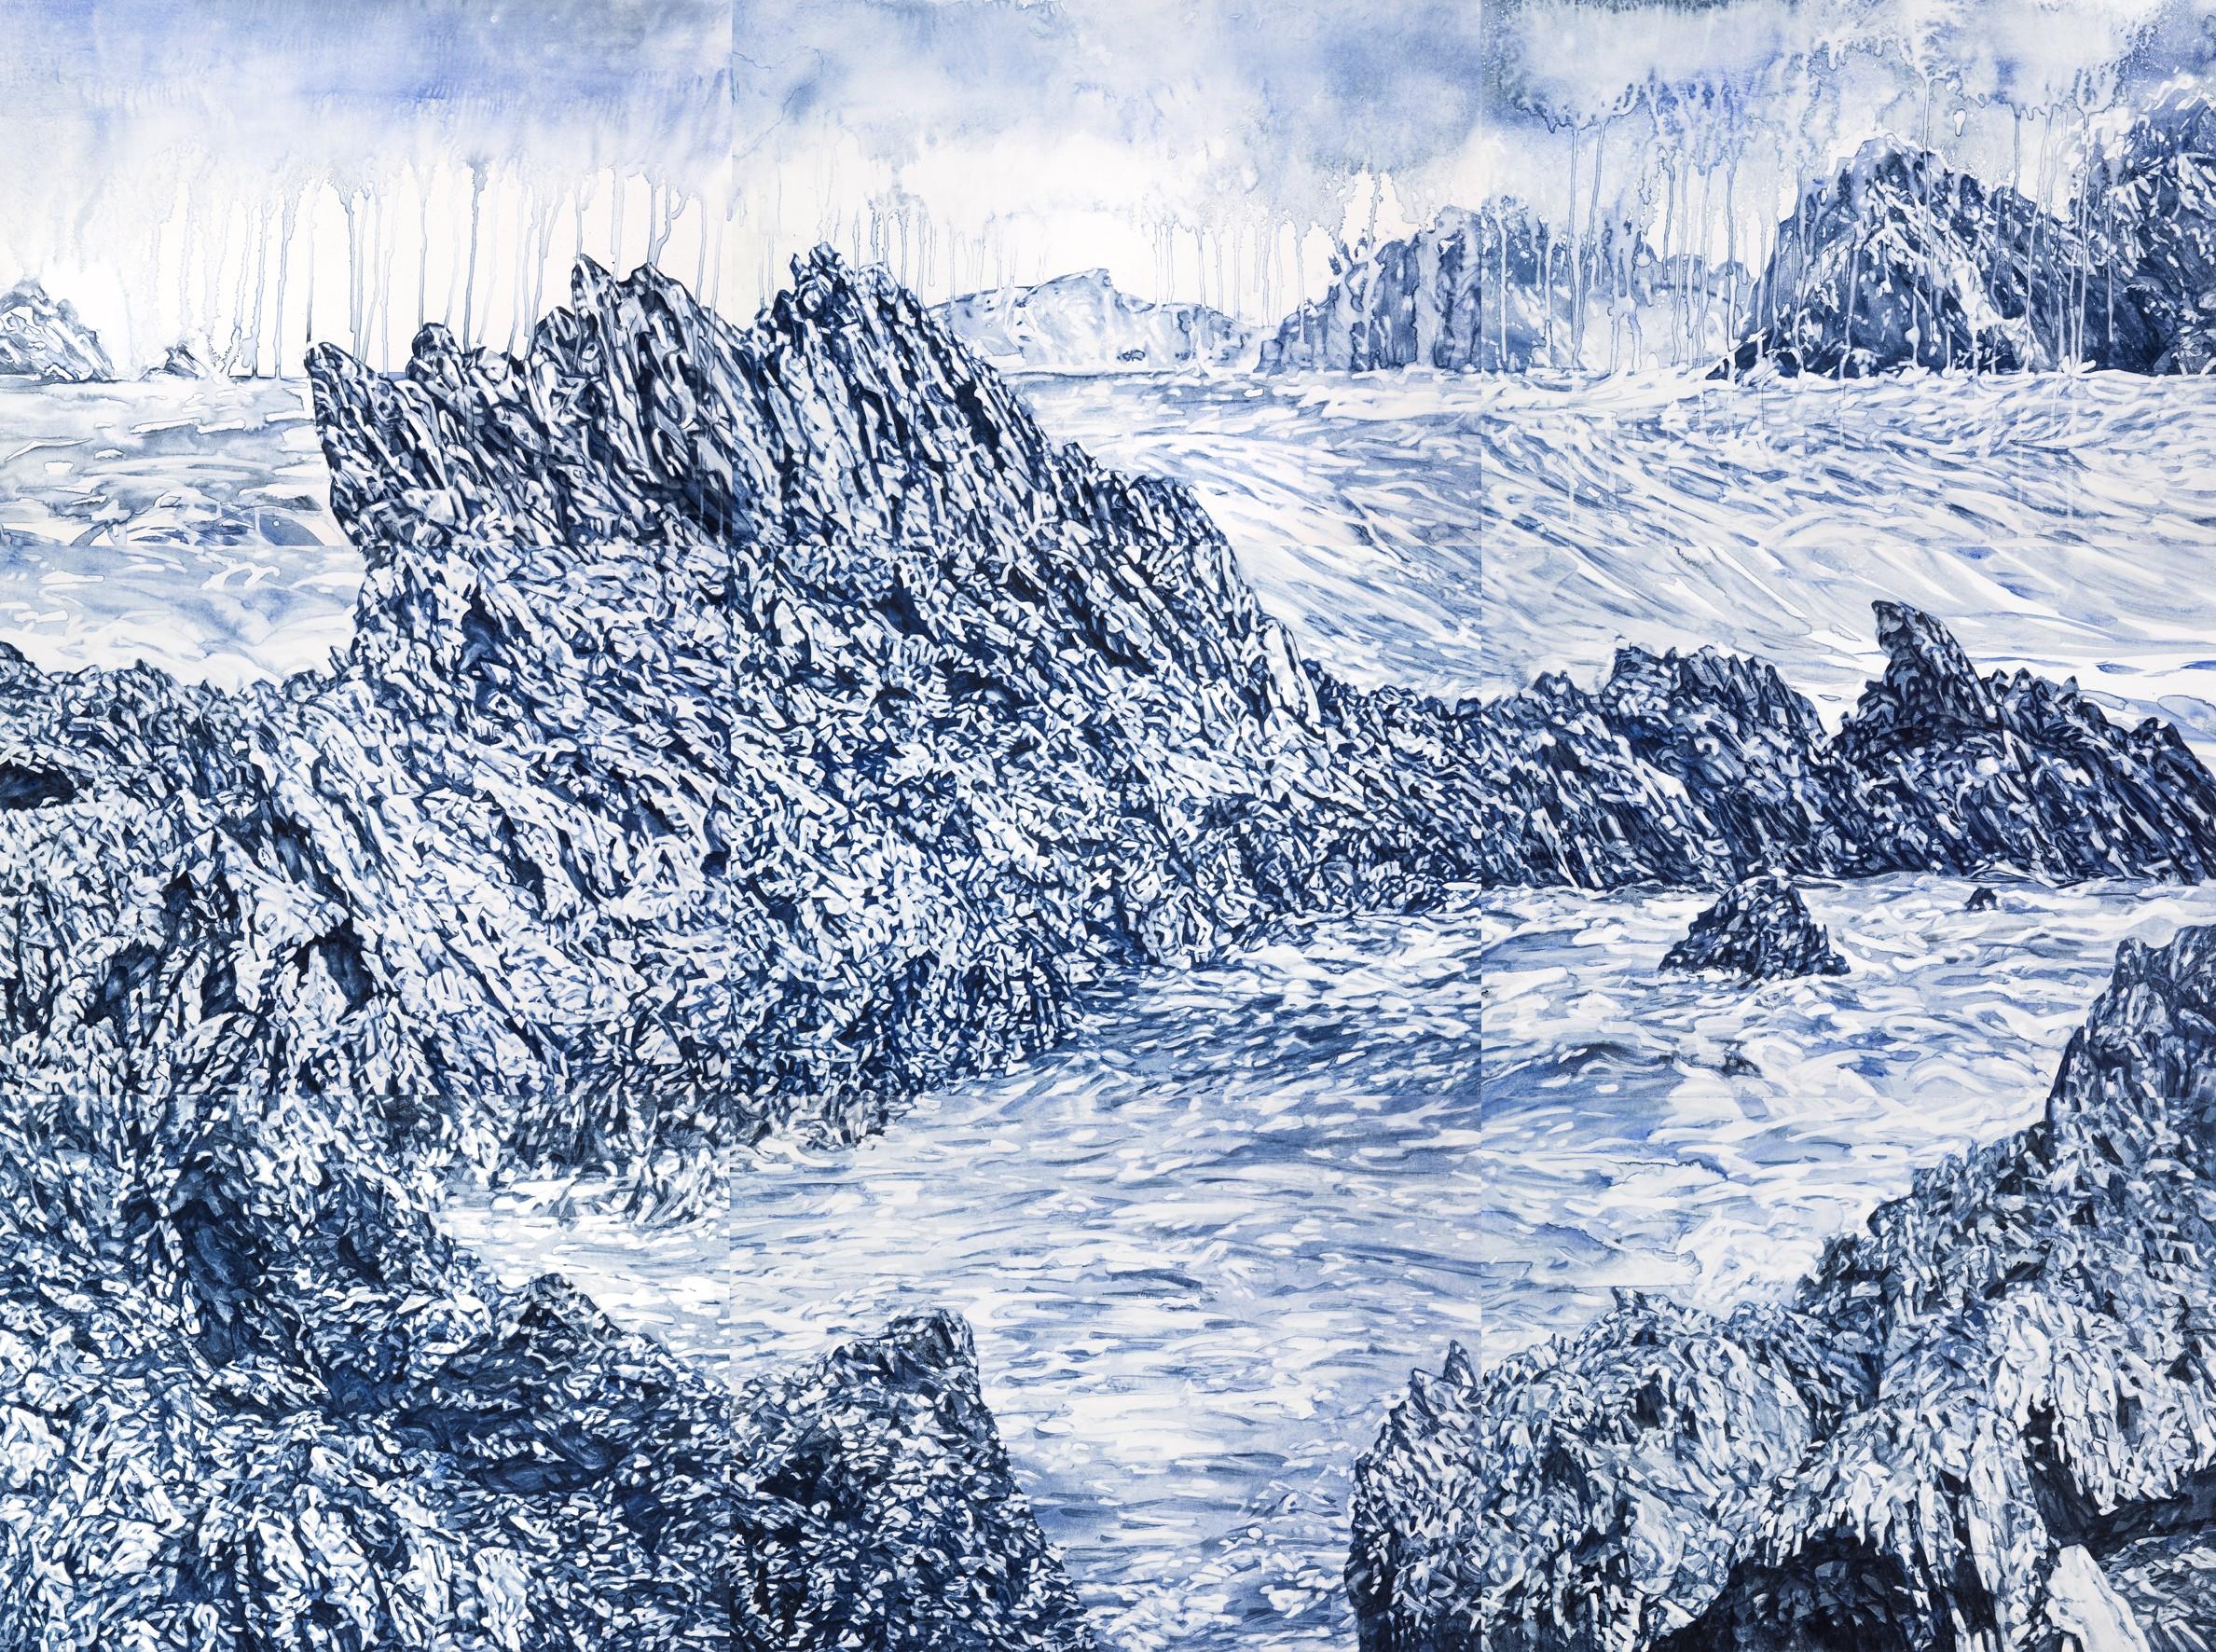 Image:  Guerilla Bay   Annika Romeyn, watercolour monotype on paper, 2019